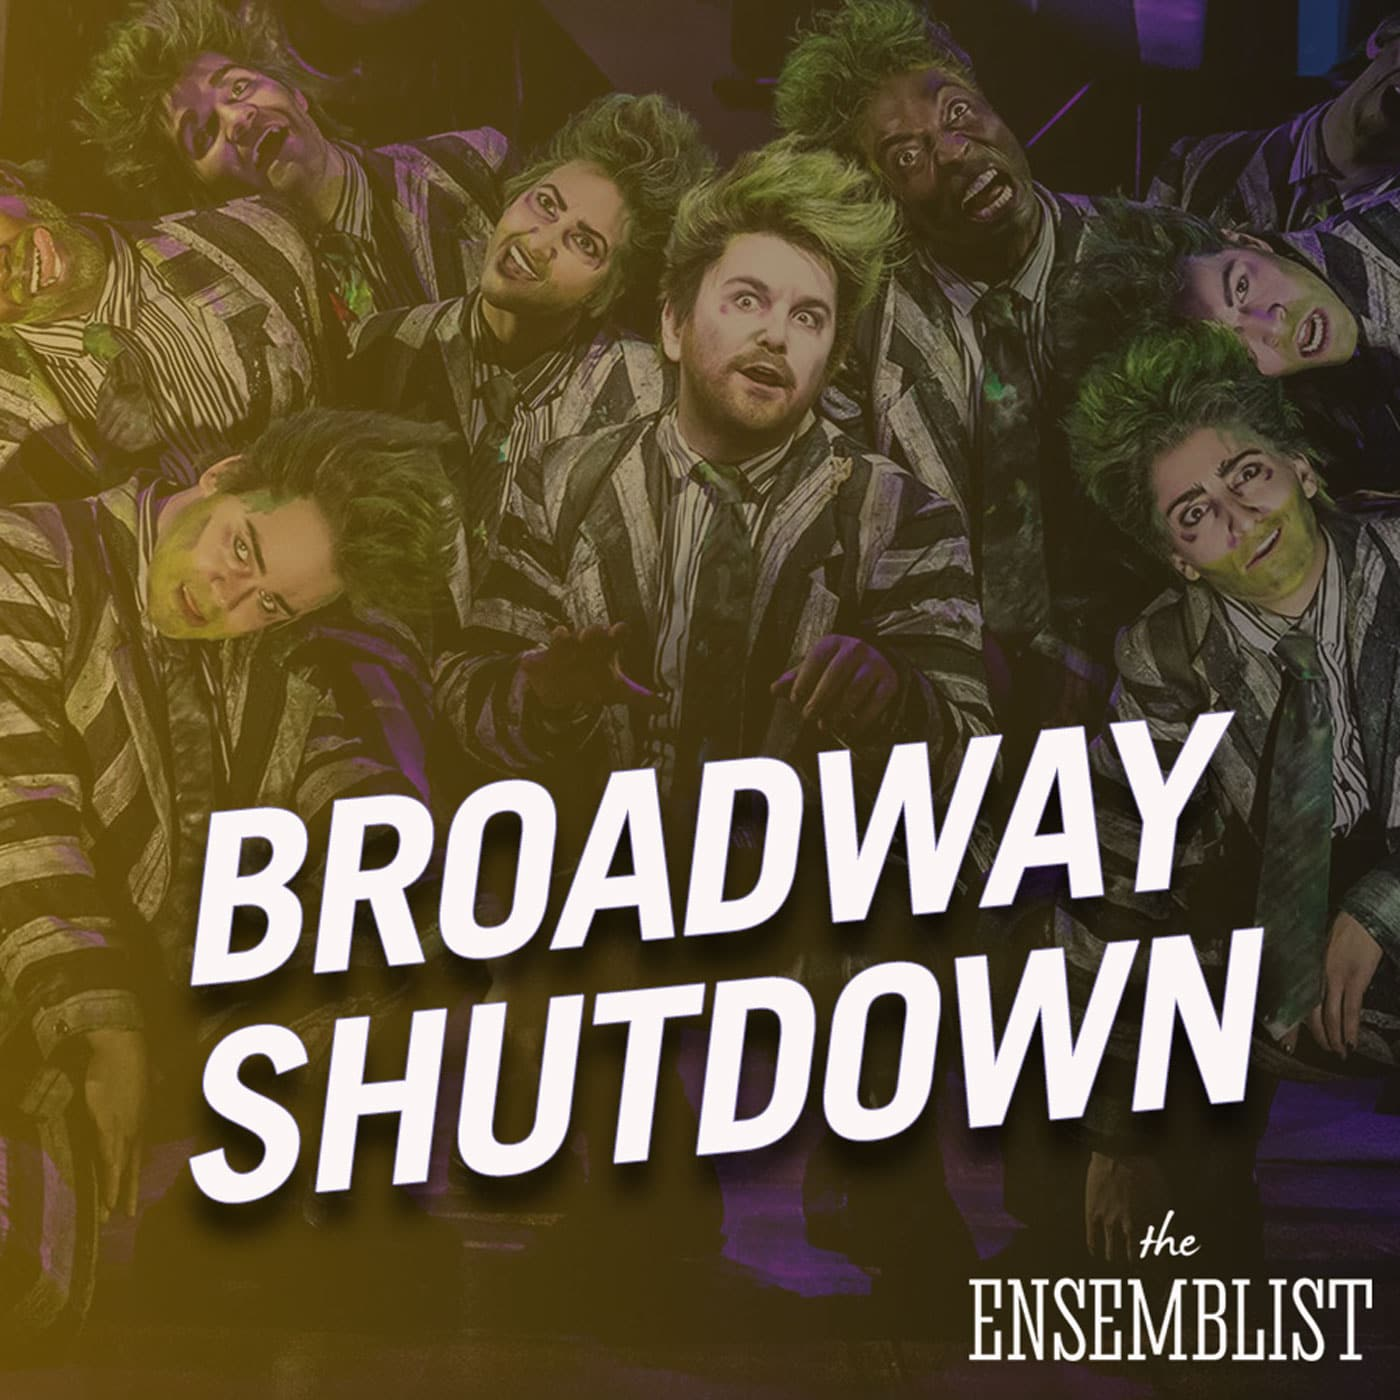 The Ensemblist - #265 - Broadway Shutdown (Beetlejuice, feat. Elliott Mattox)